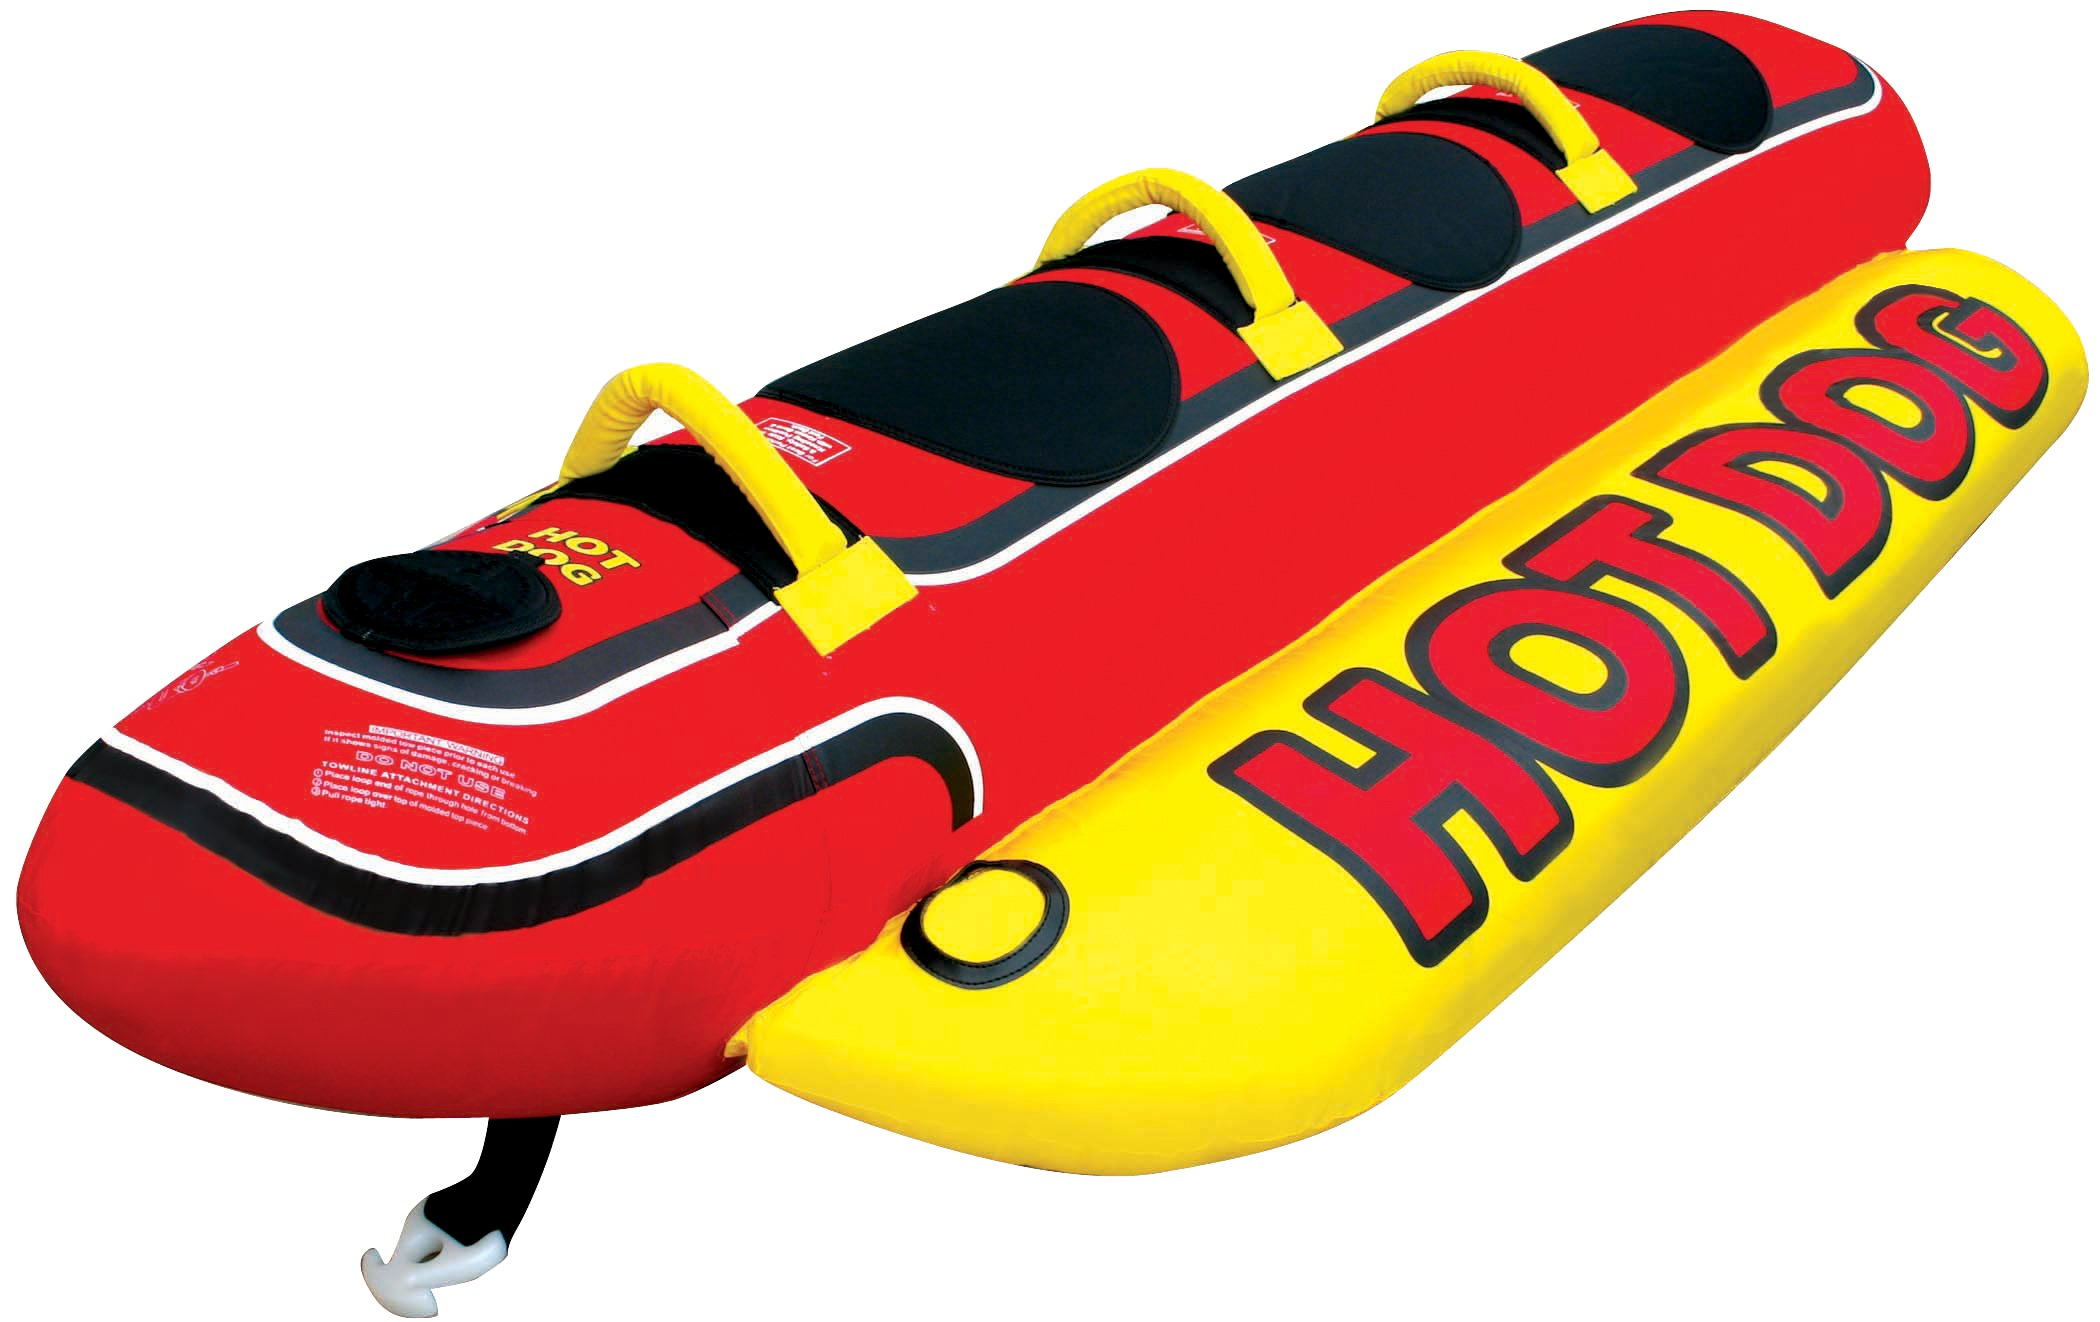 Airhead Hd-3 Hot Dog Towable 8